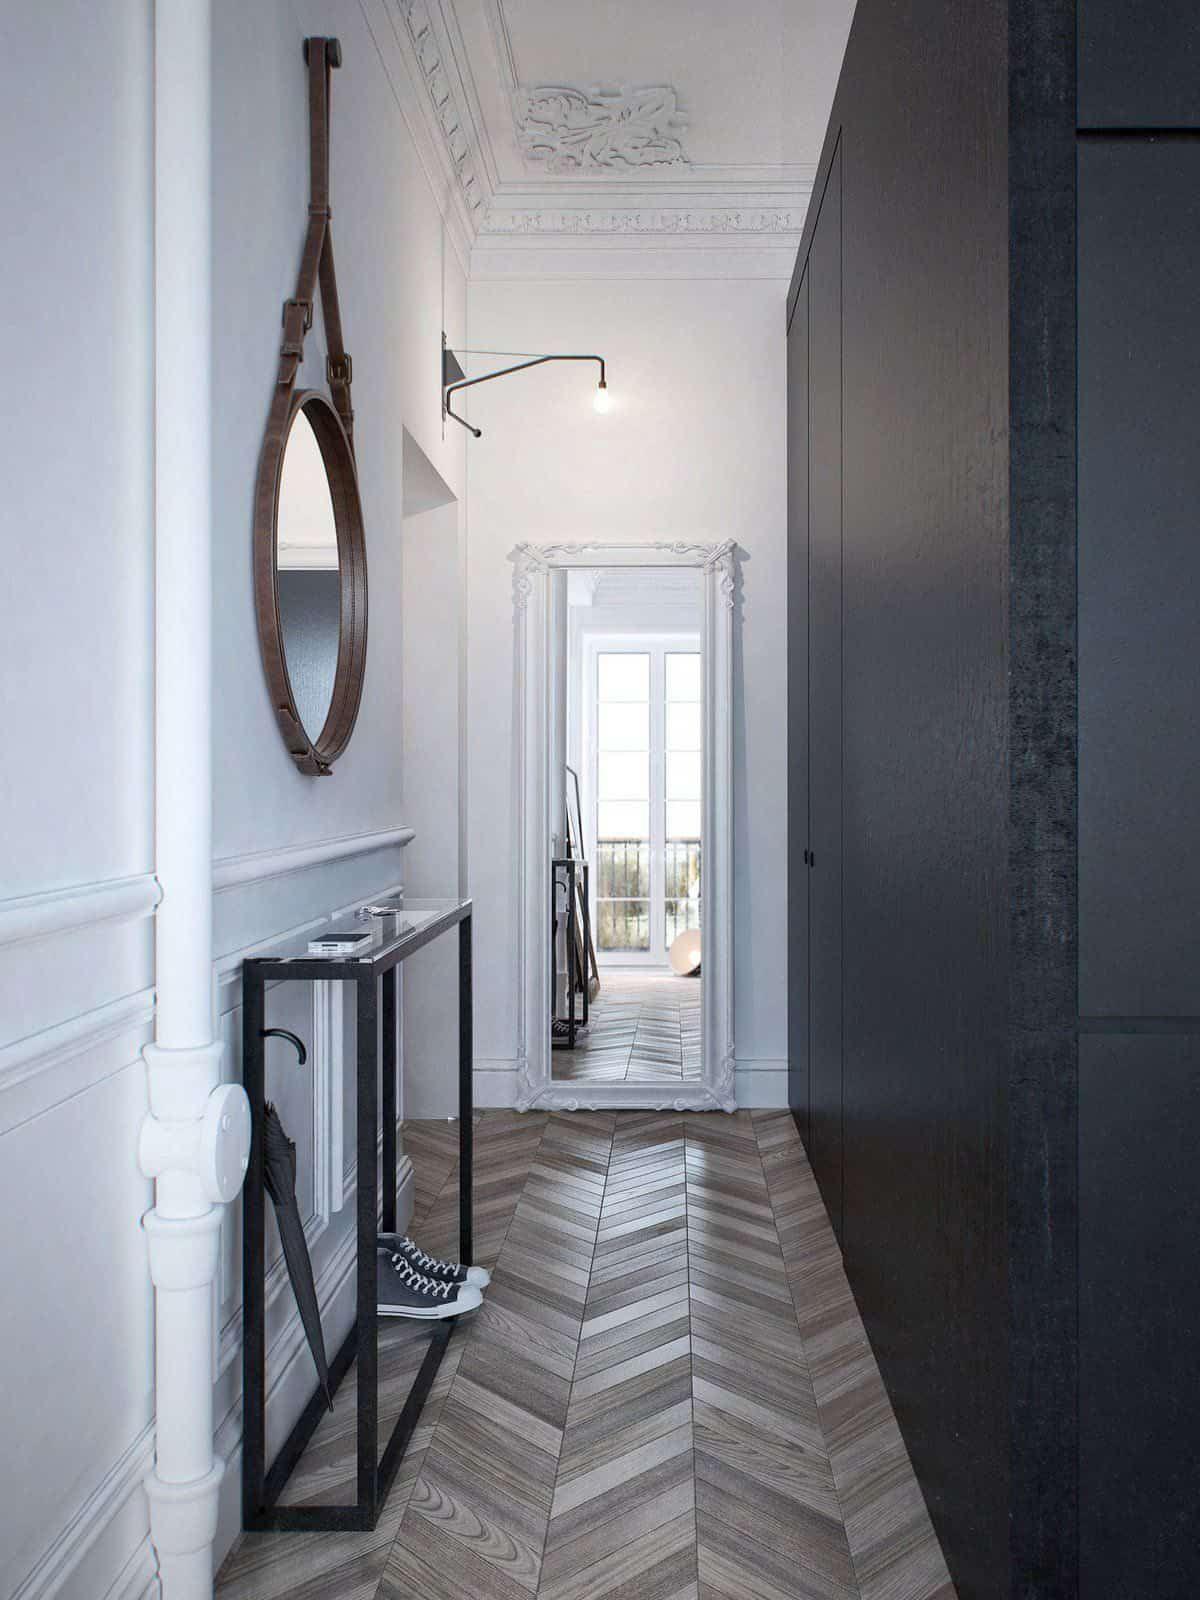 Long hallway decor ideas  Long Hallway With Wall Mirror And Herringbone Floors Also Black Wall